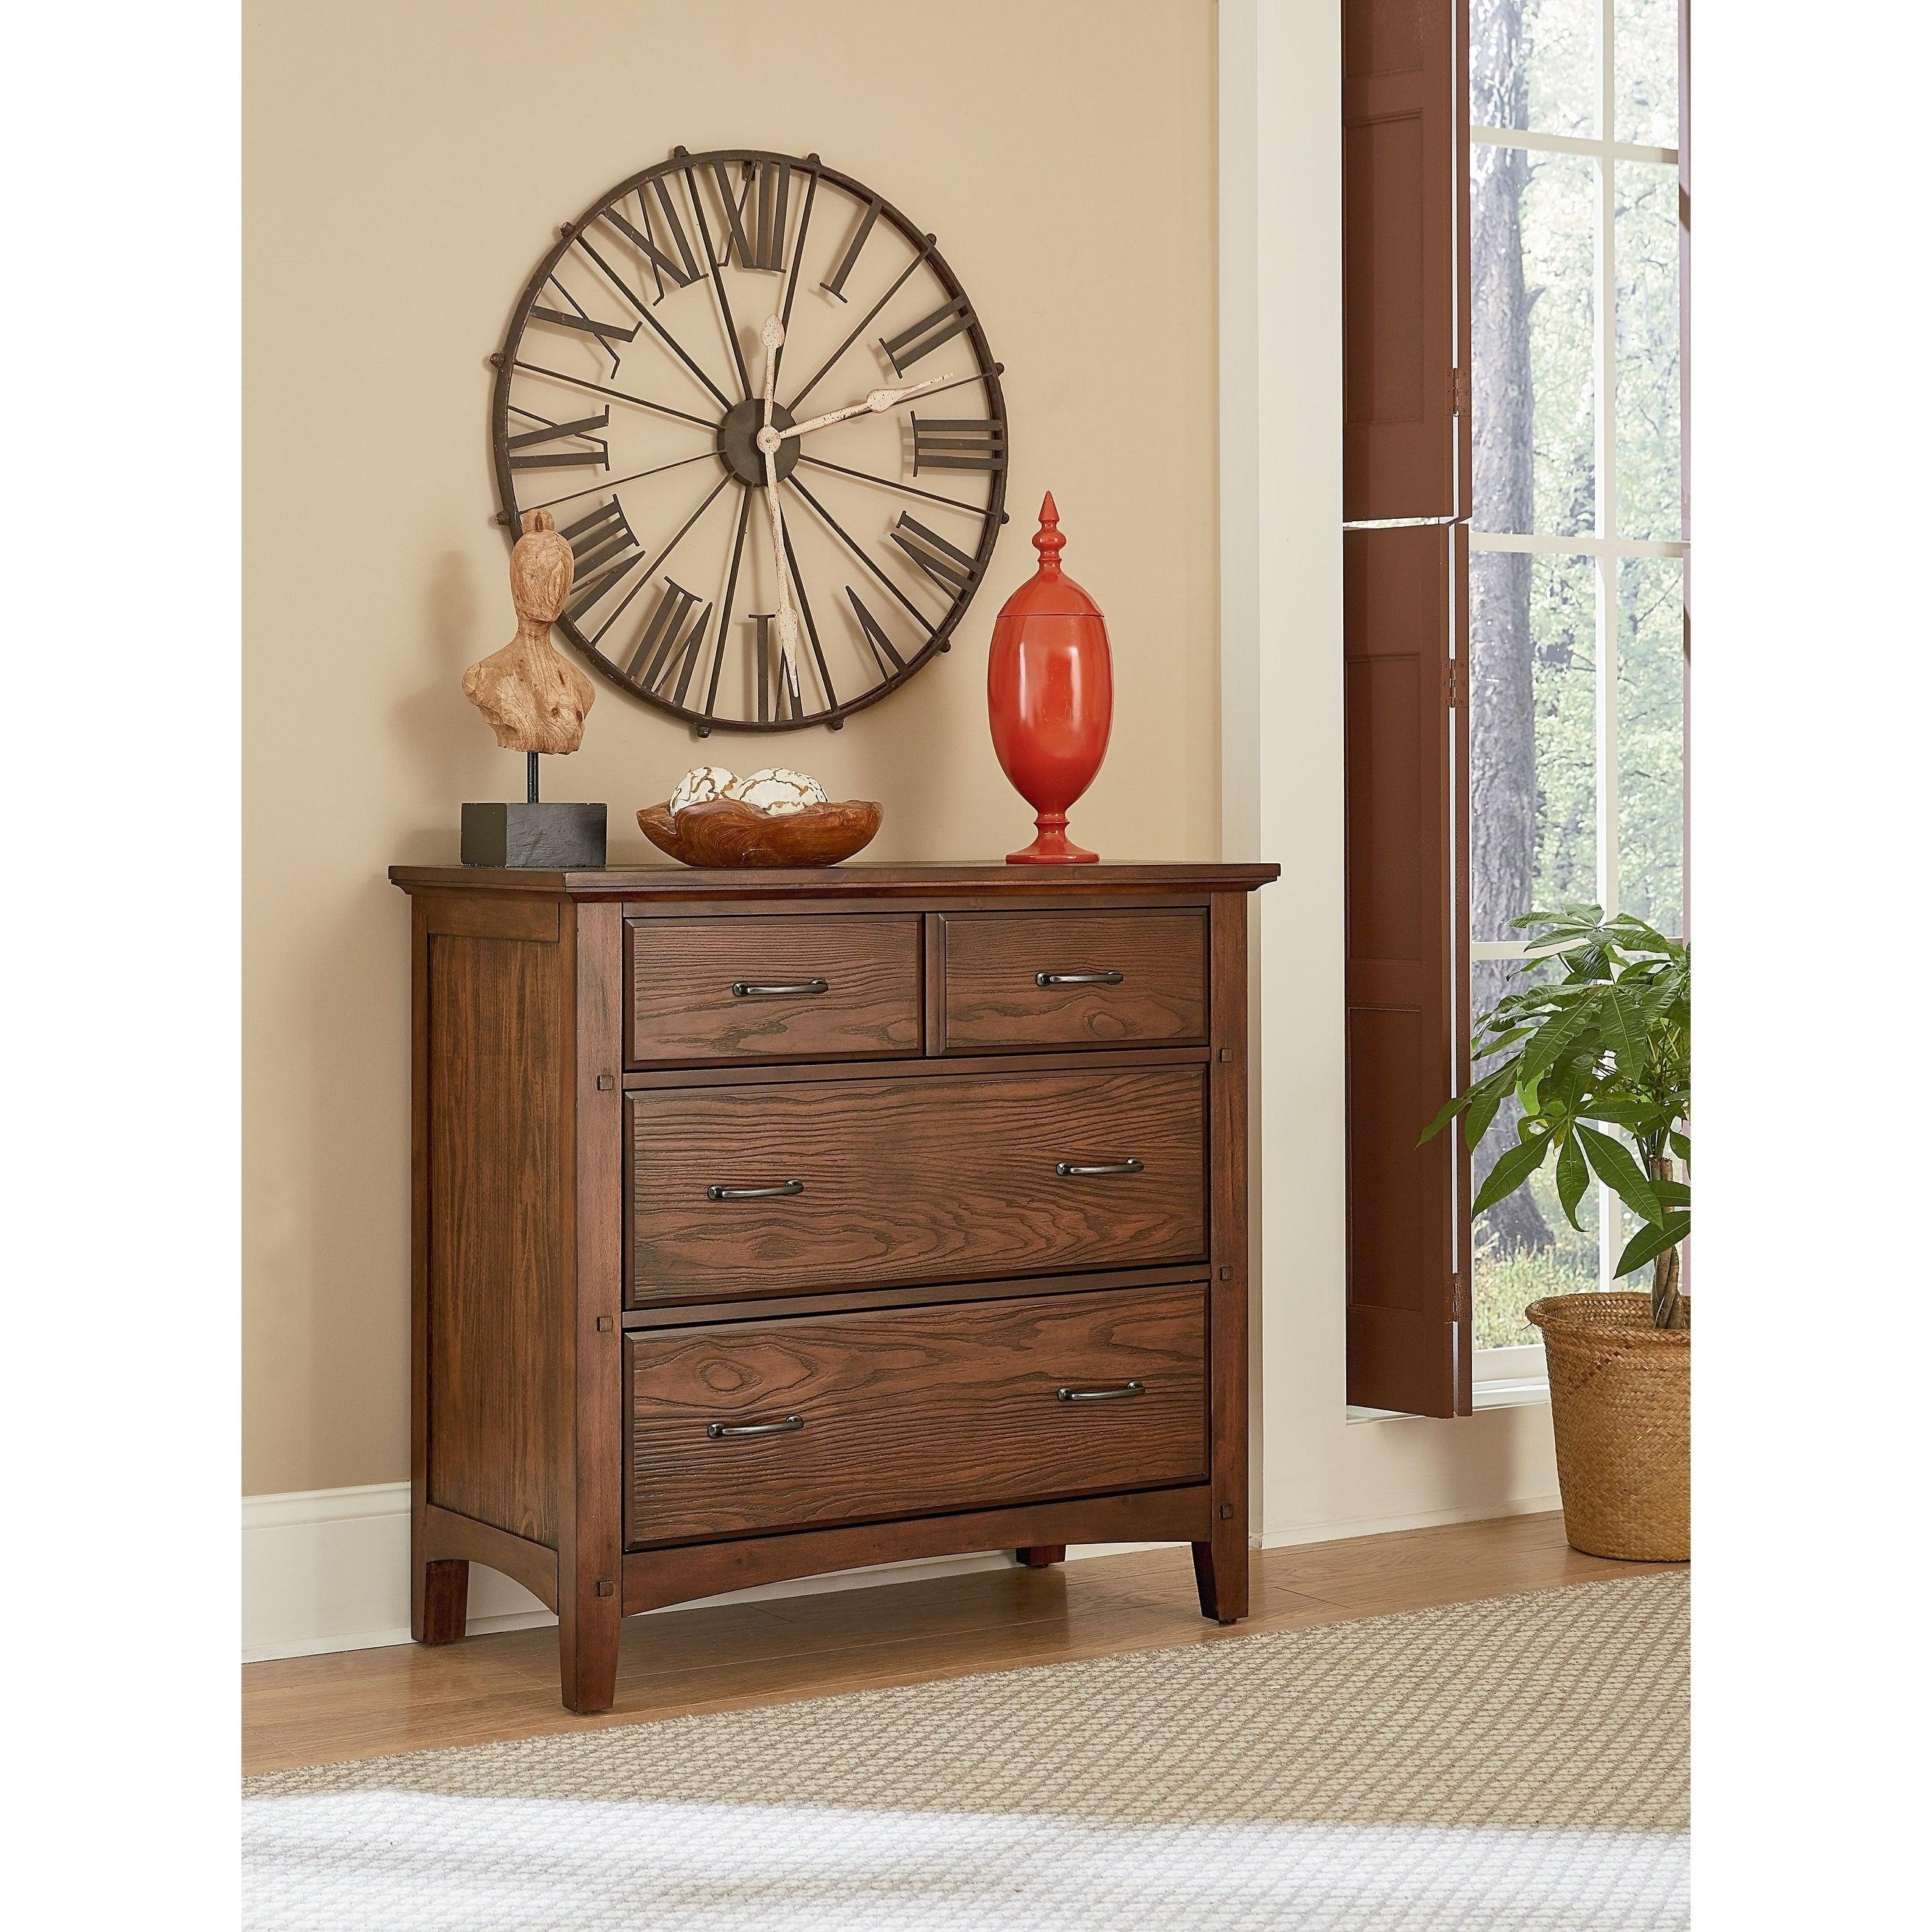 OSP Home Furnishings Modern Mission Bedroom 3 Drawer Chest in Vintage Oak Finish